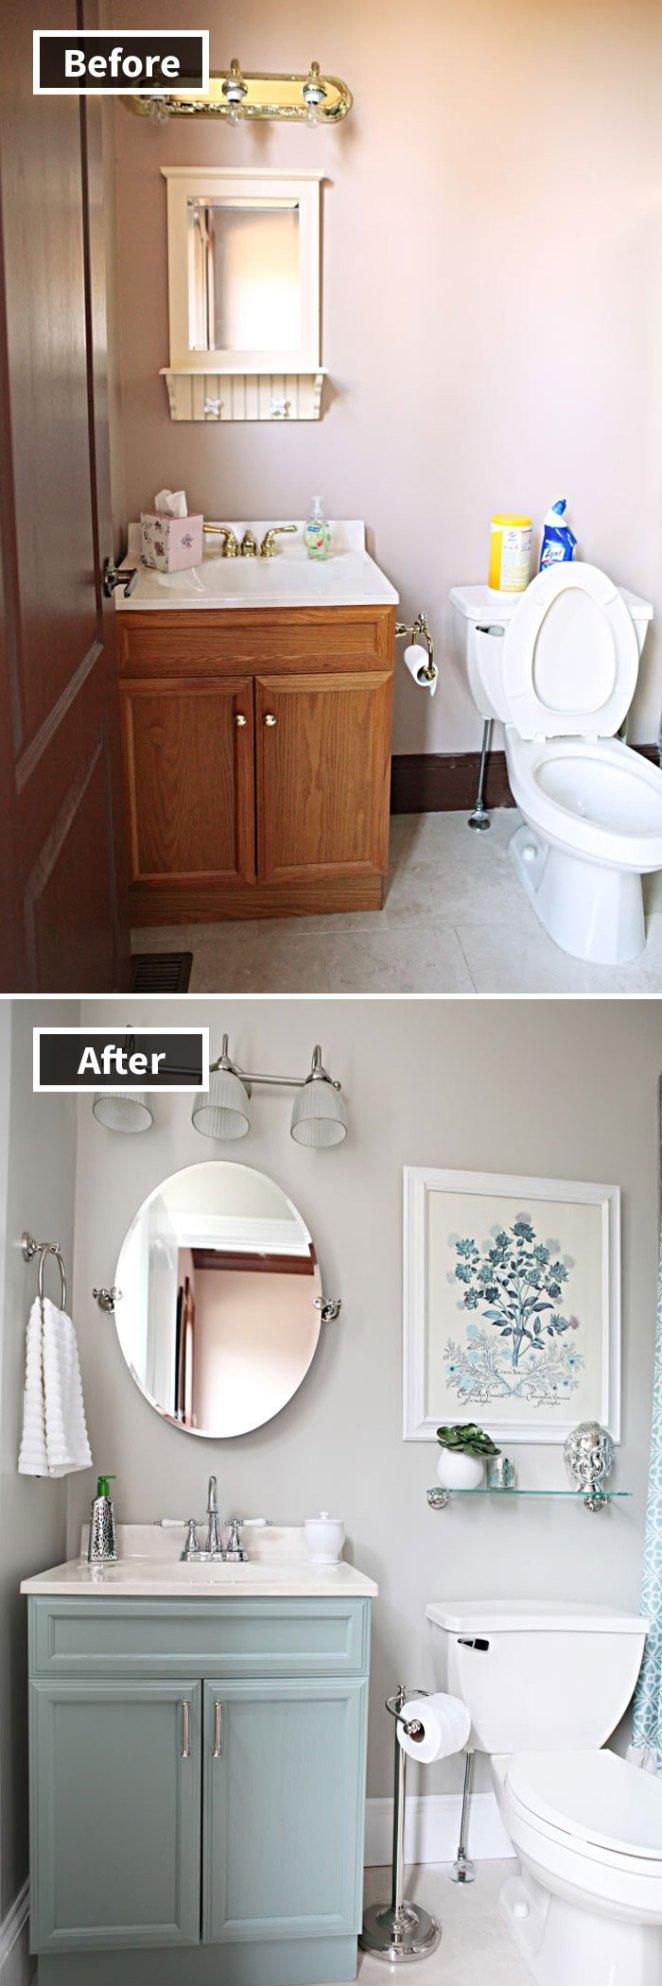 Office Bathroom Reveal